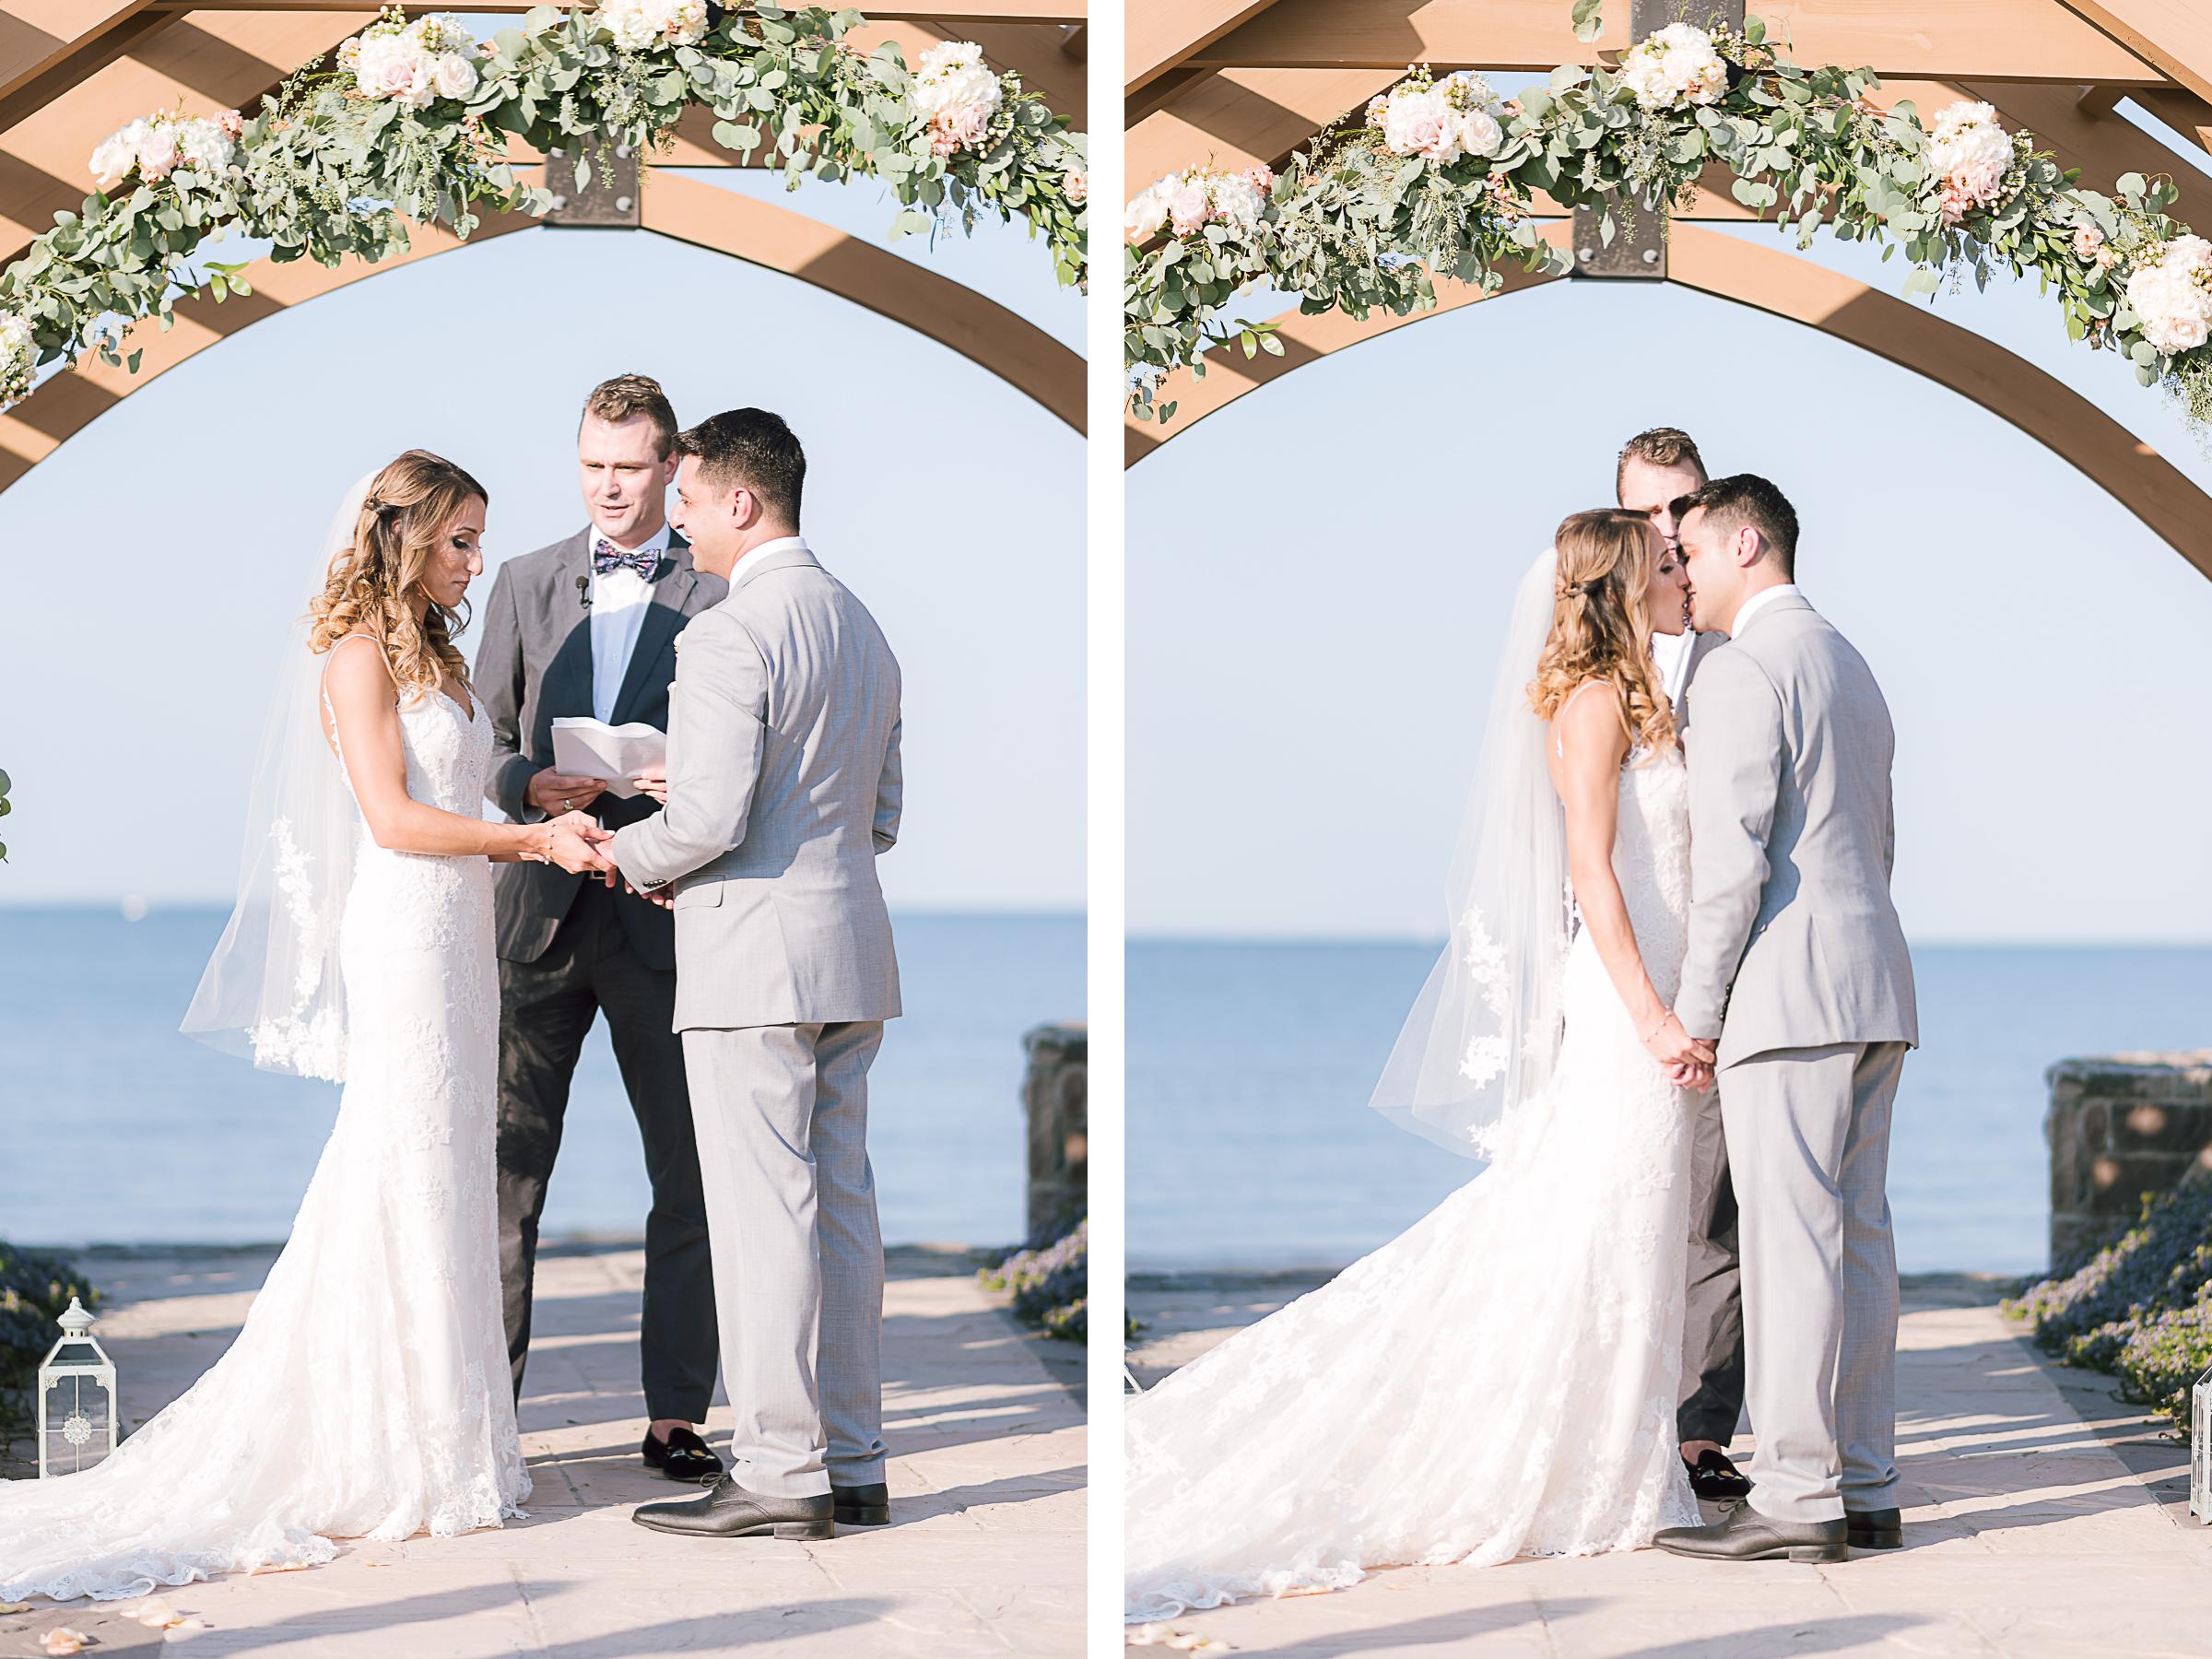 MD-Herrington-on-the-Bay-Wedding-Ceremony-First-Kiss.jpg